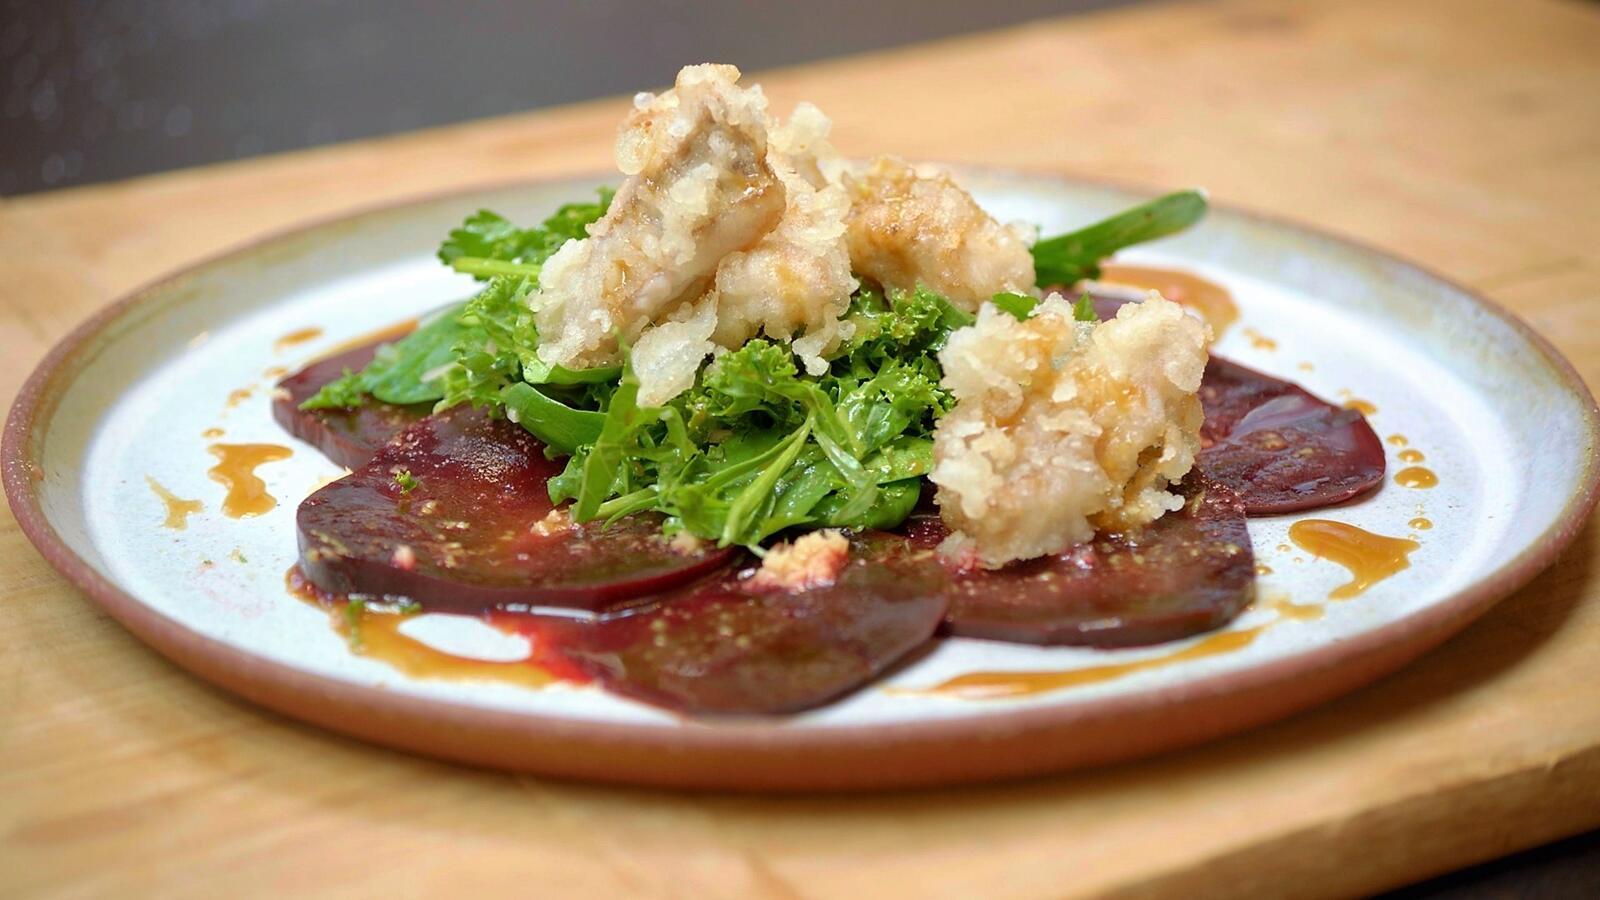 Salade met boerenkool, rode biet en hondshaai